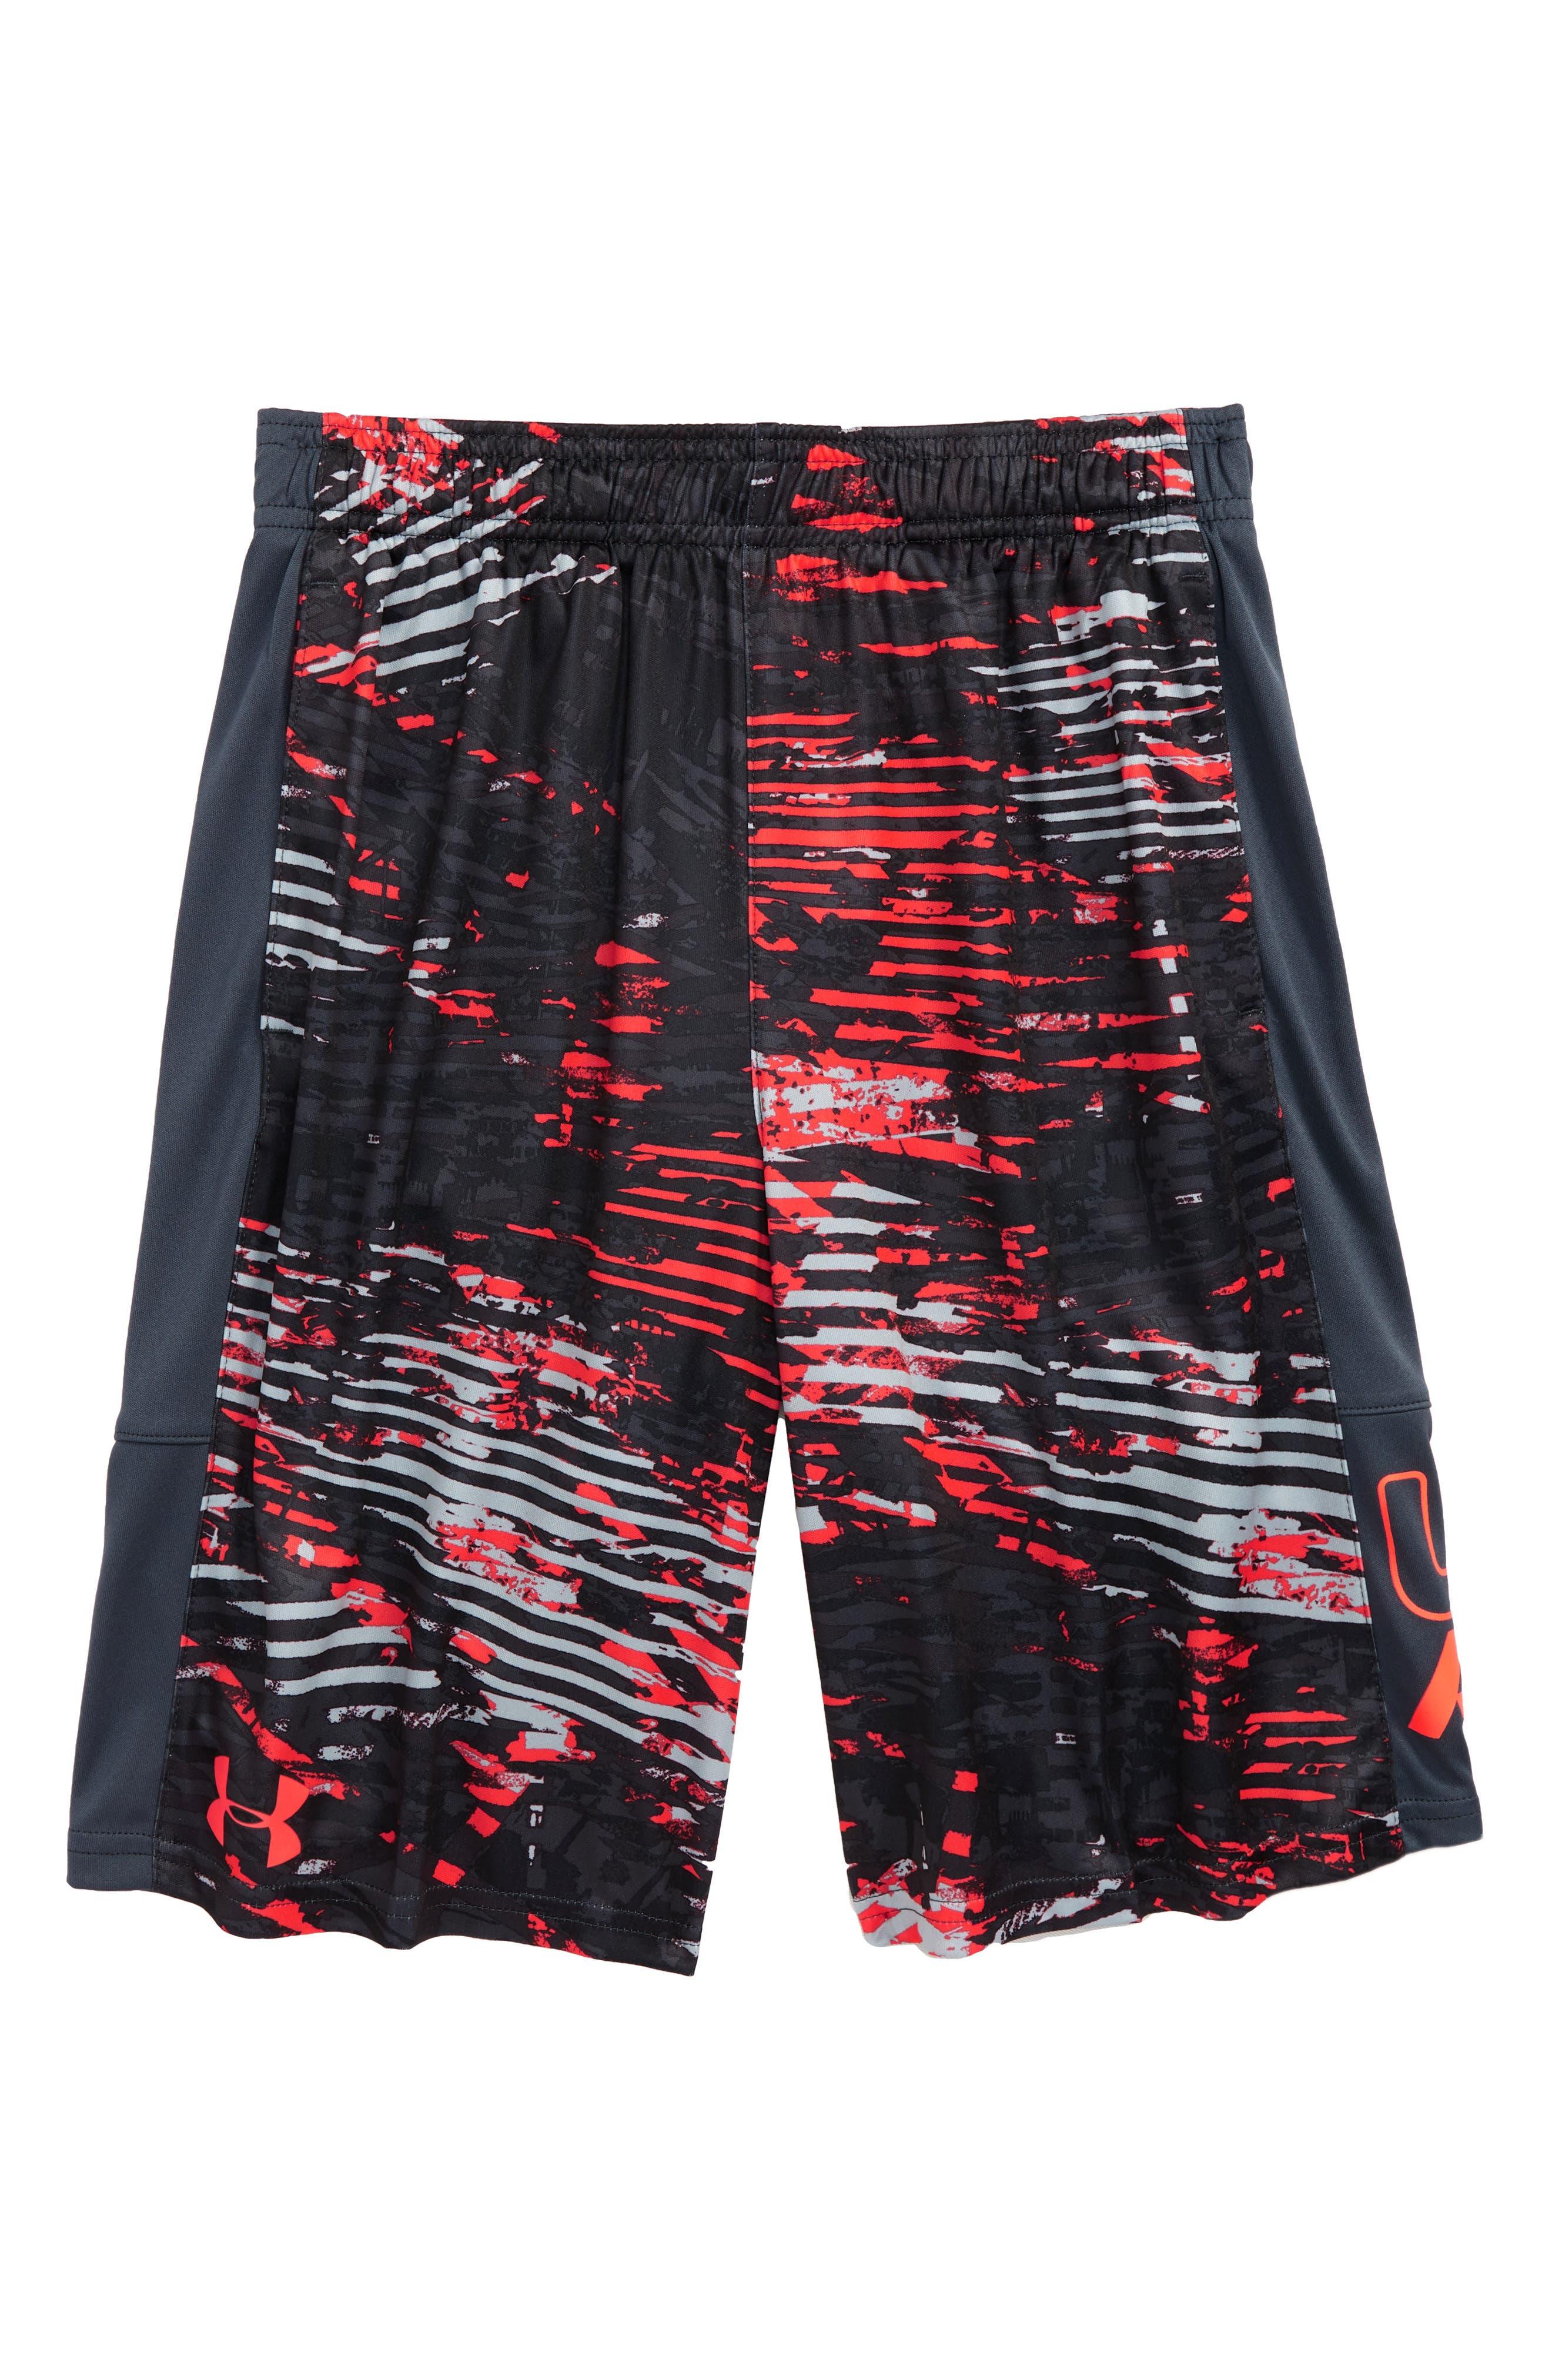 Stunt HeatGear<sup>®</sup> Shorts,                             Main thumbnail 1, color,                             Neon Coral/ Stealth Gray